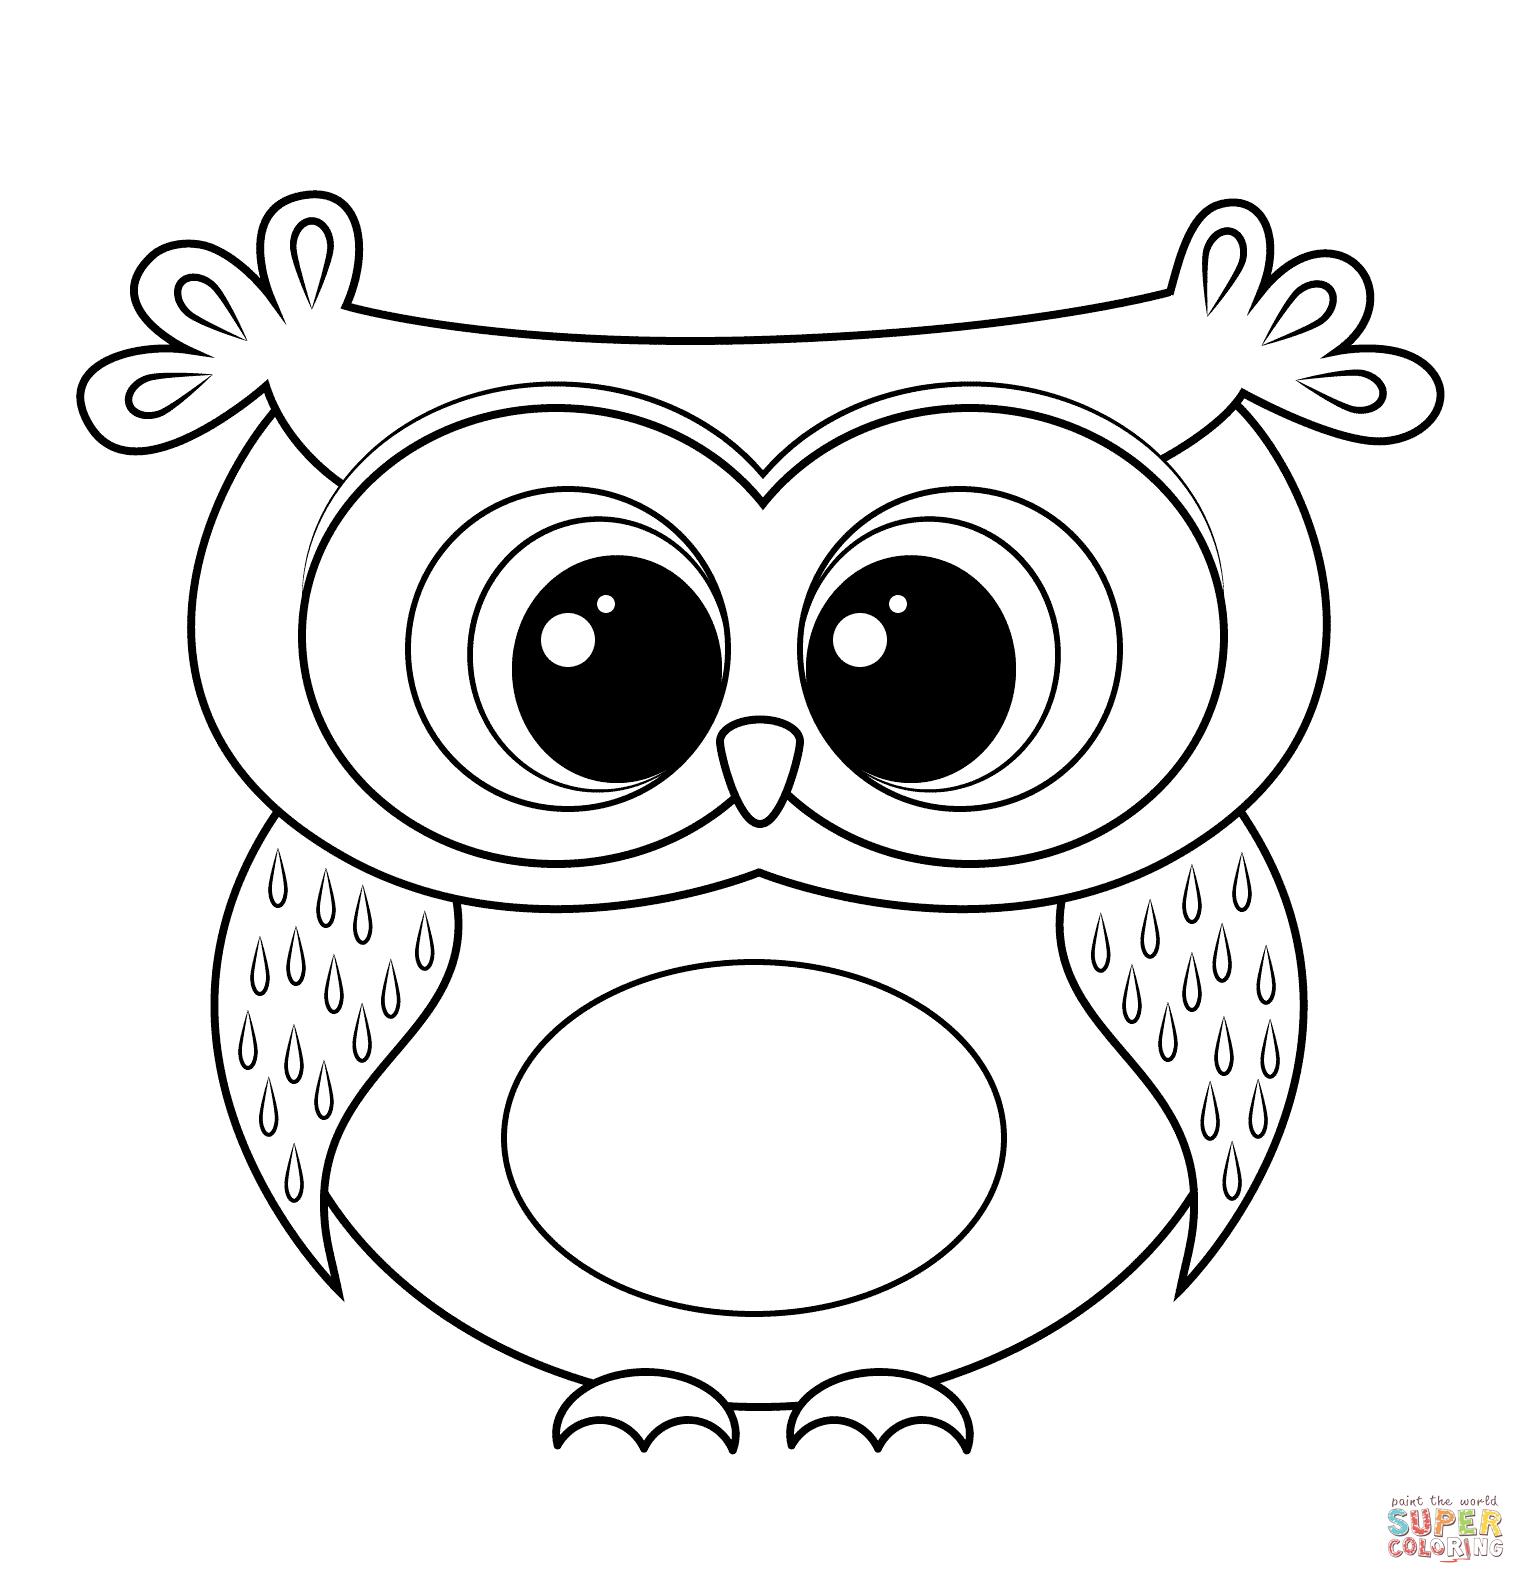 1526x1584 Cartoon Owl Drawing How To Draw A Cute Cartoon Owl Easy Stepstep